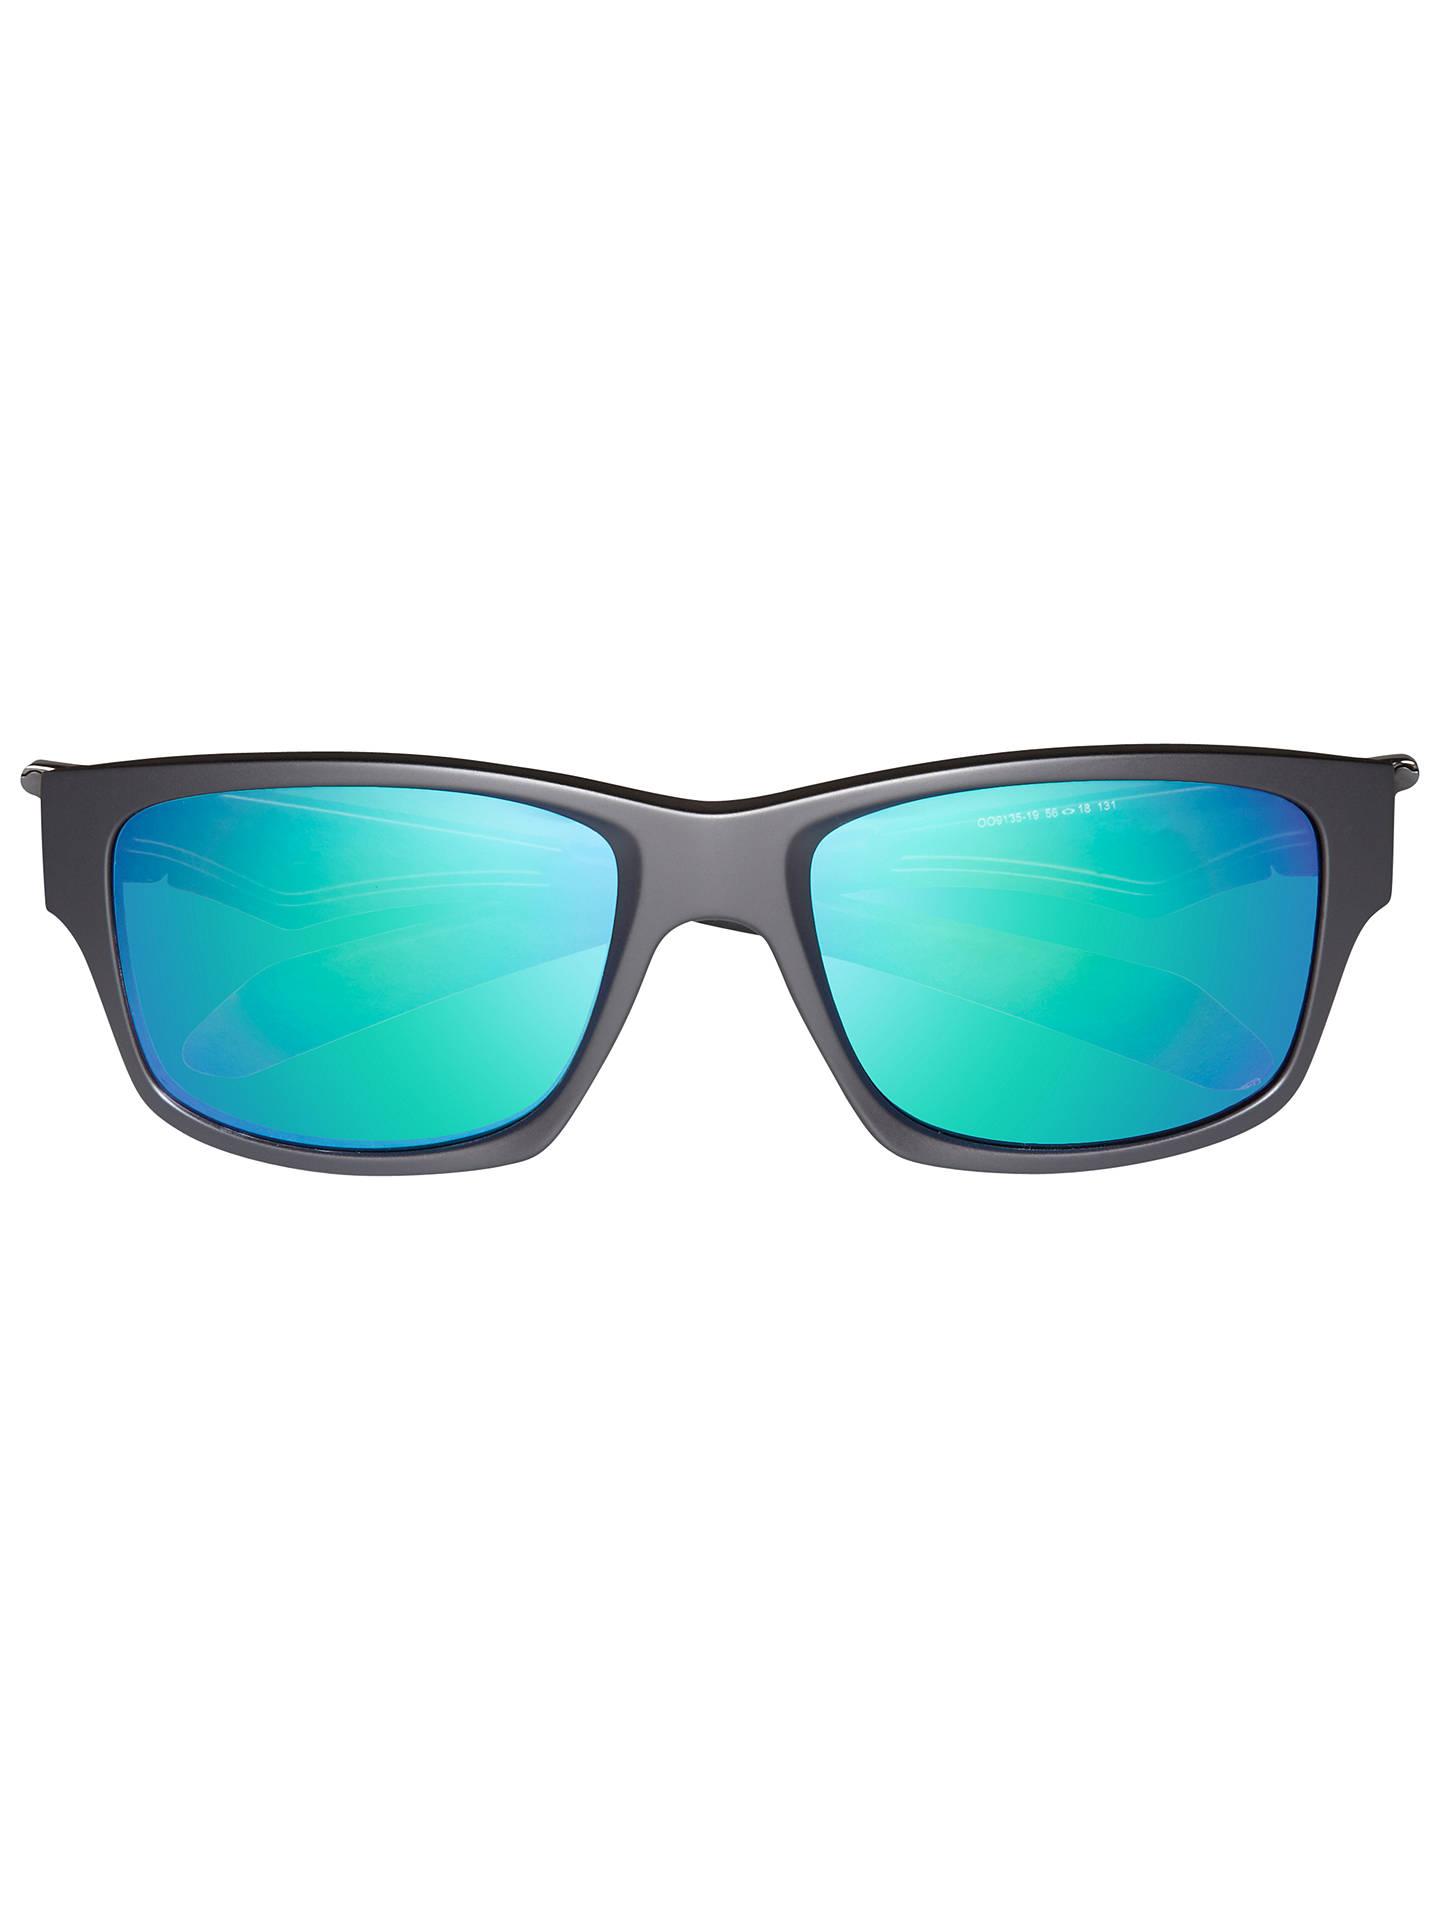 4dc93fdaf35 Oakley OO9135 Jupiter Polarised Square Framed Sunglasses at John ...